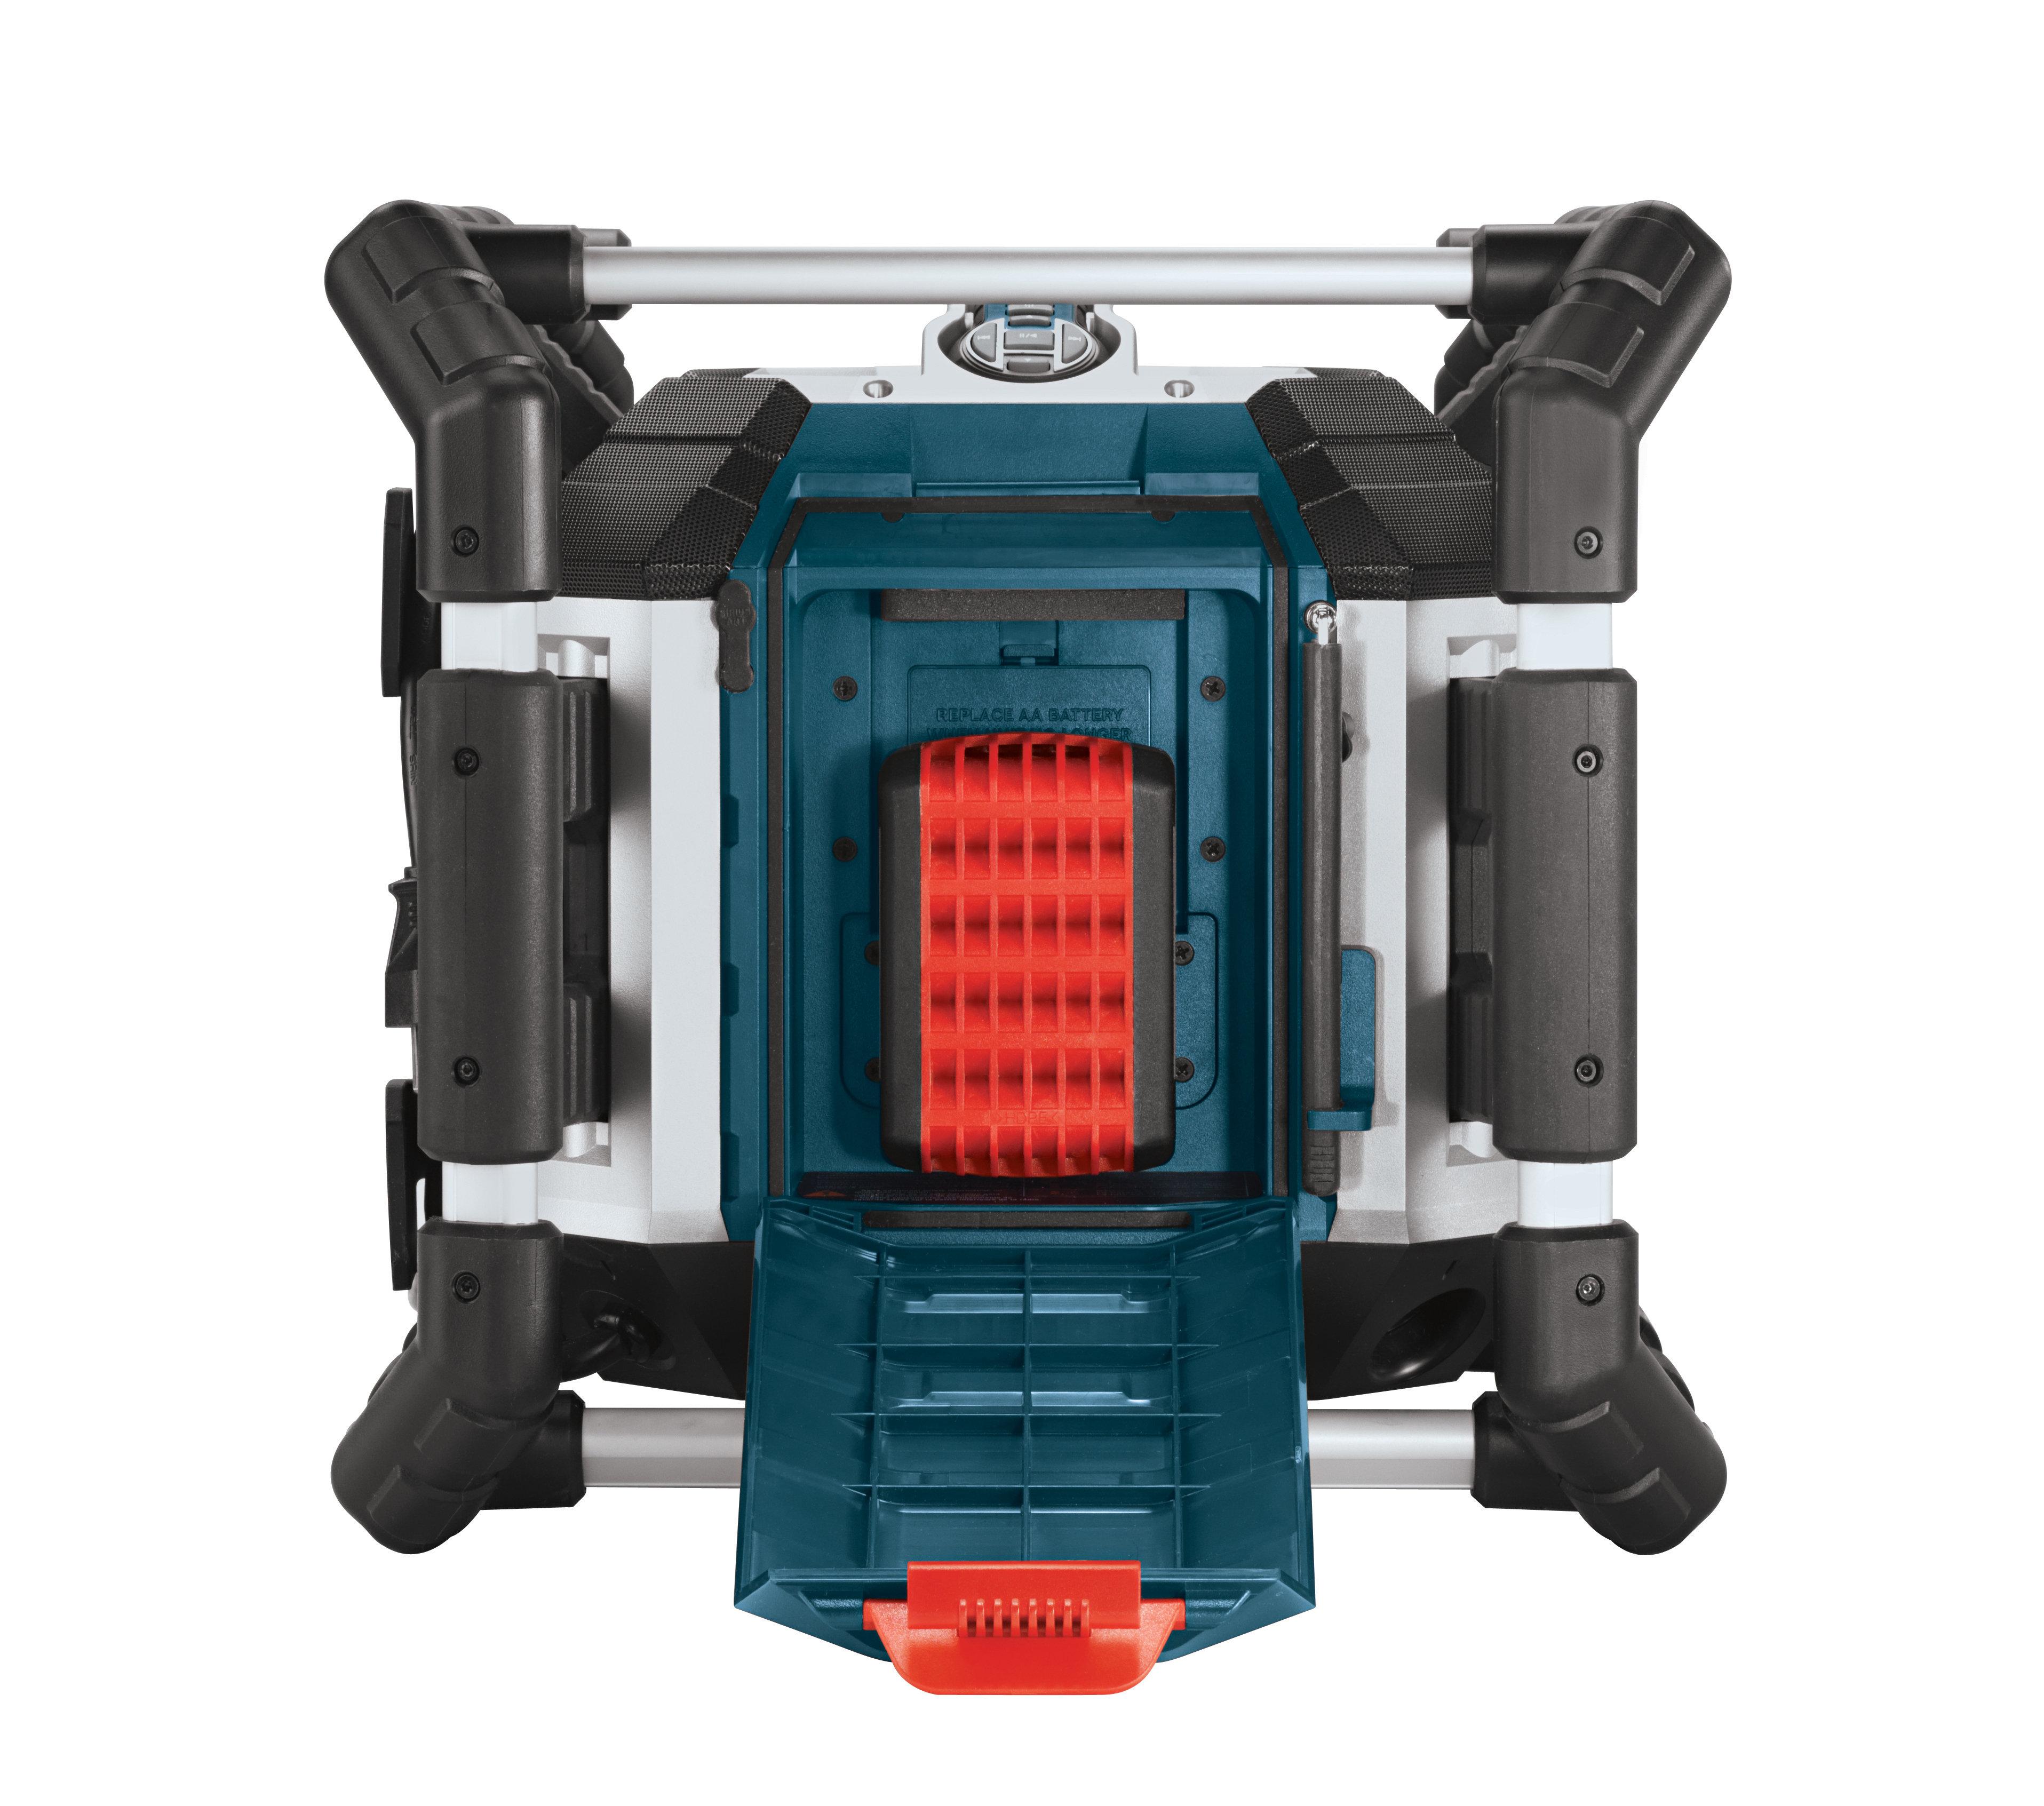 bosch pb360d cordless power box jobsite radio slim. Black Bedroom Furniture Sets. Home Design Ideas